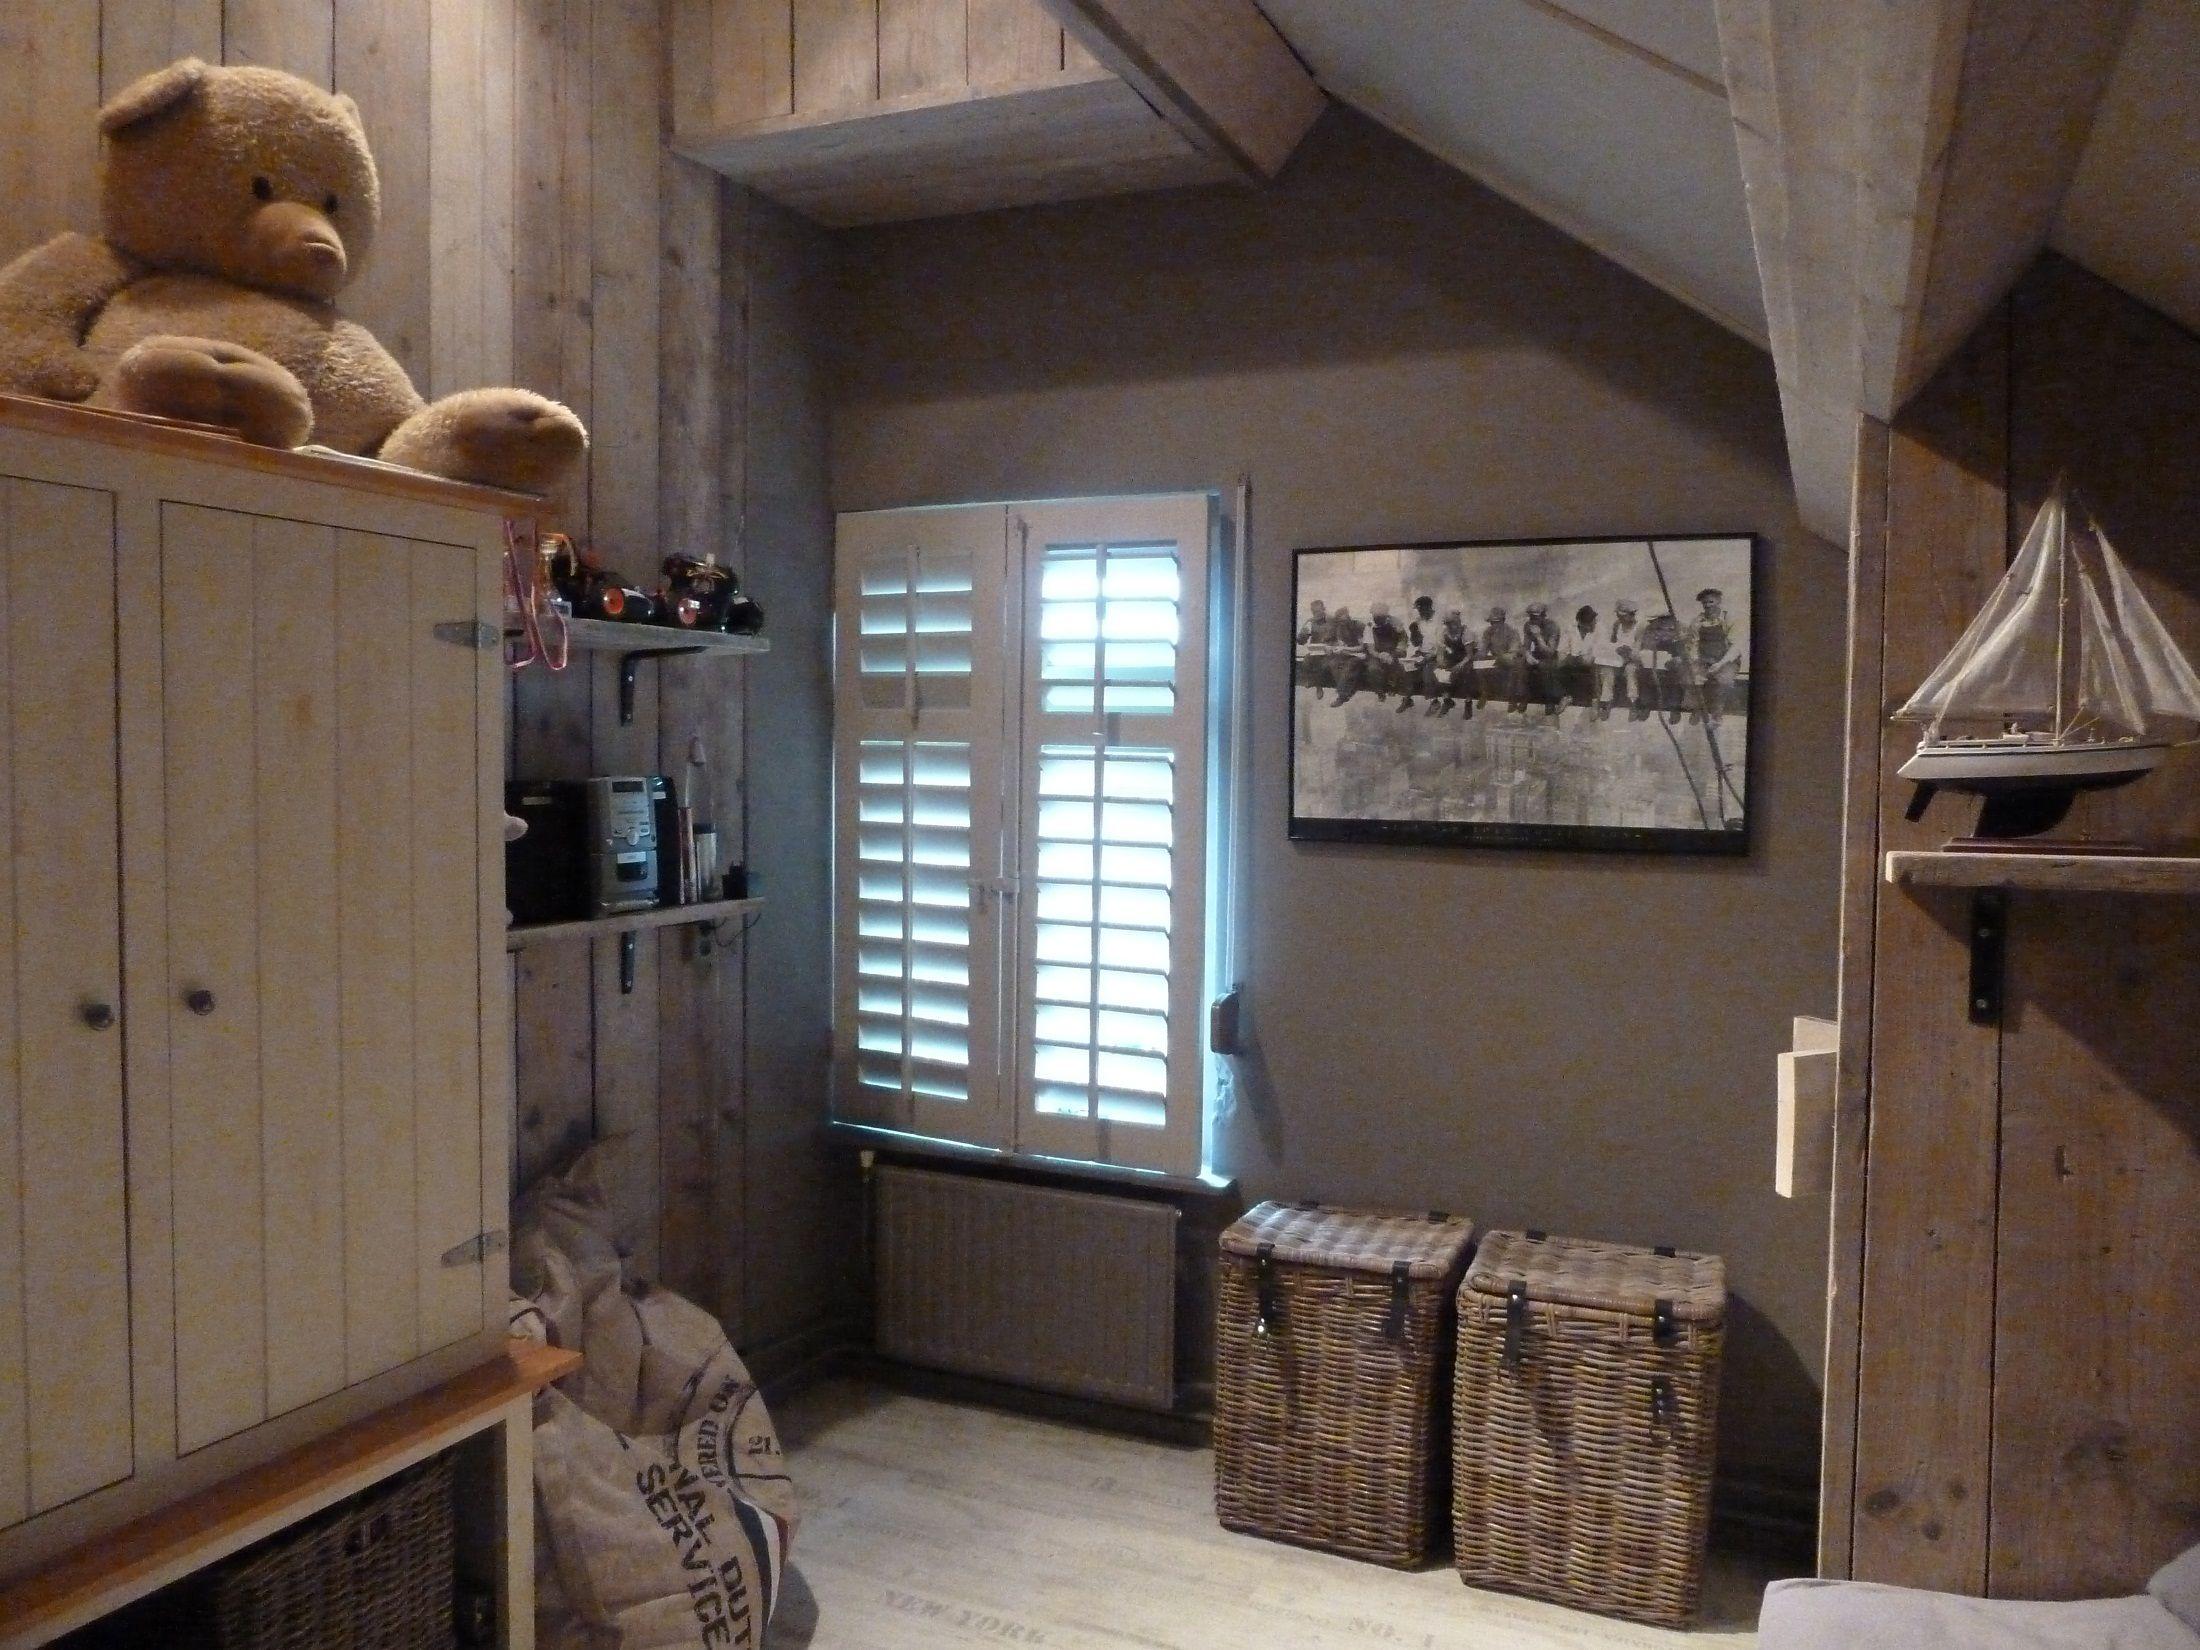 Prachtige met steigerhout gestylde kinder slaapkamer | interieur ...